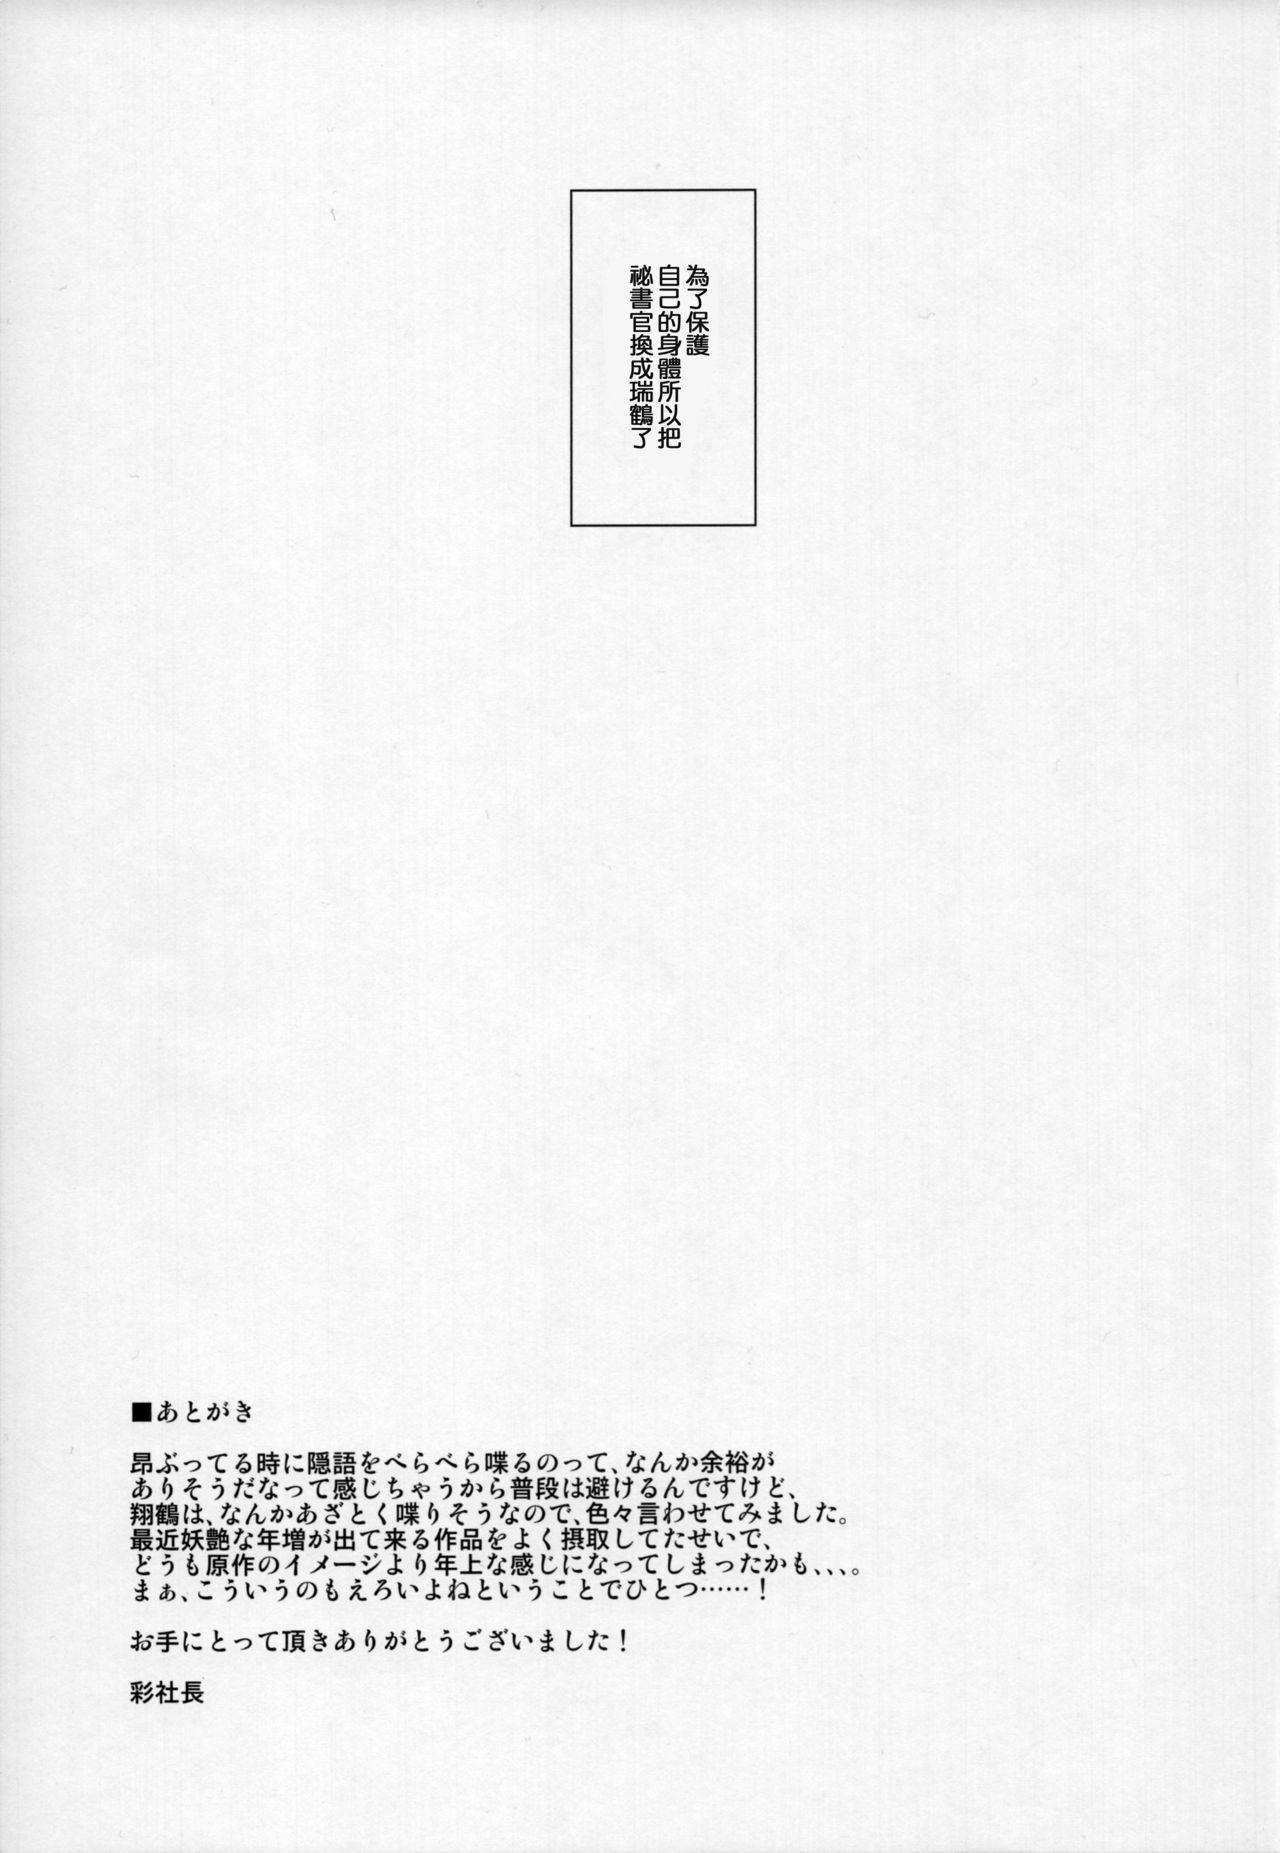 Kaiin Douyoku Bokan Shoukaku 23